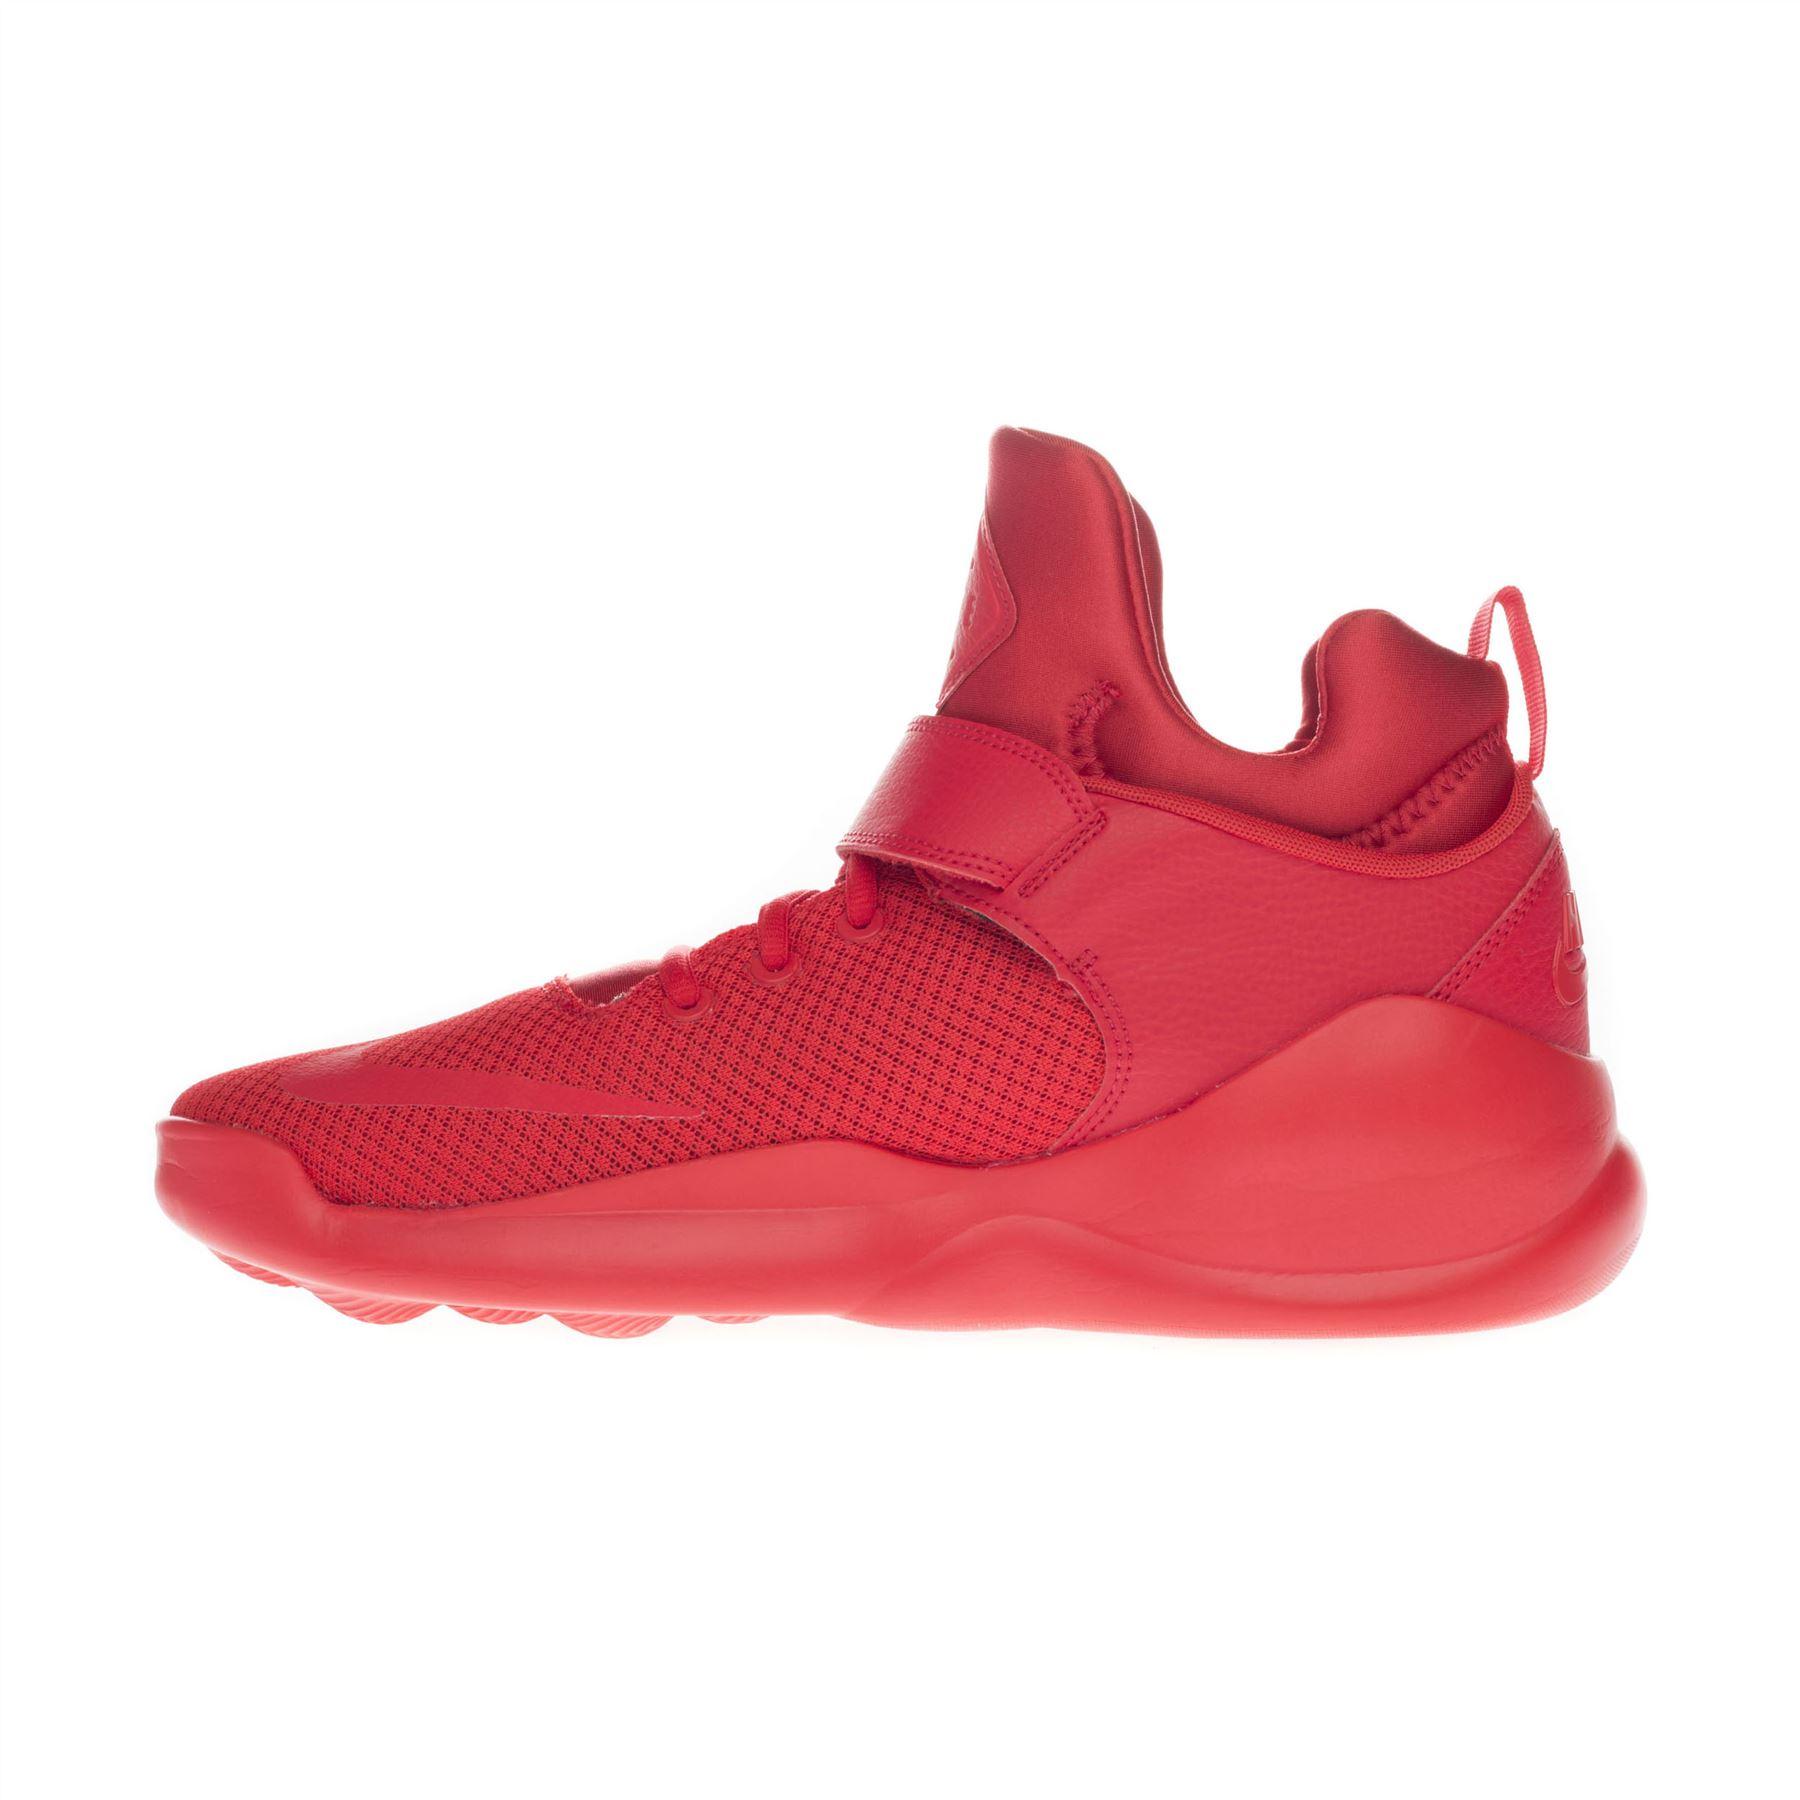 81383ee4c274 Nike Men s Kwazi Hi Top Active Running Gym Strap Lace Up Sports ...